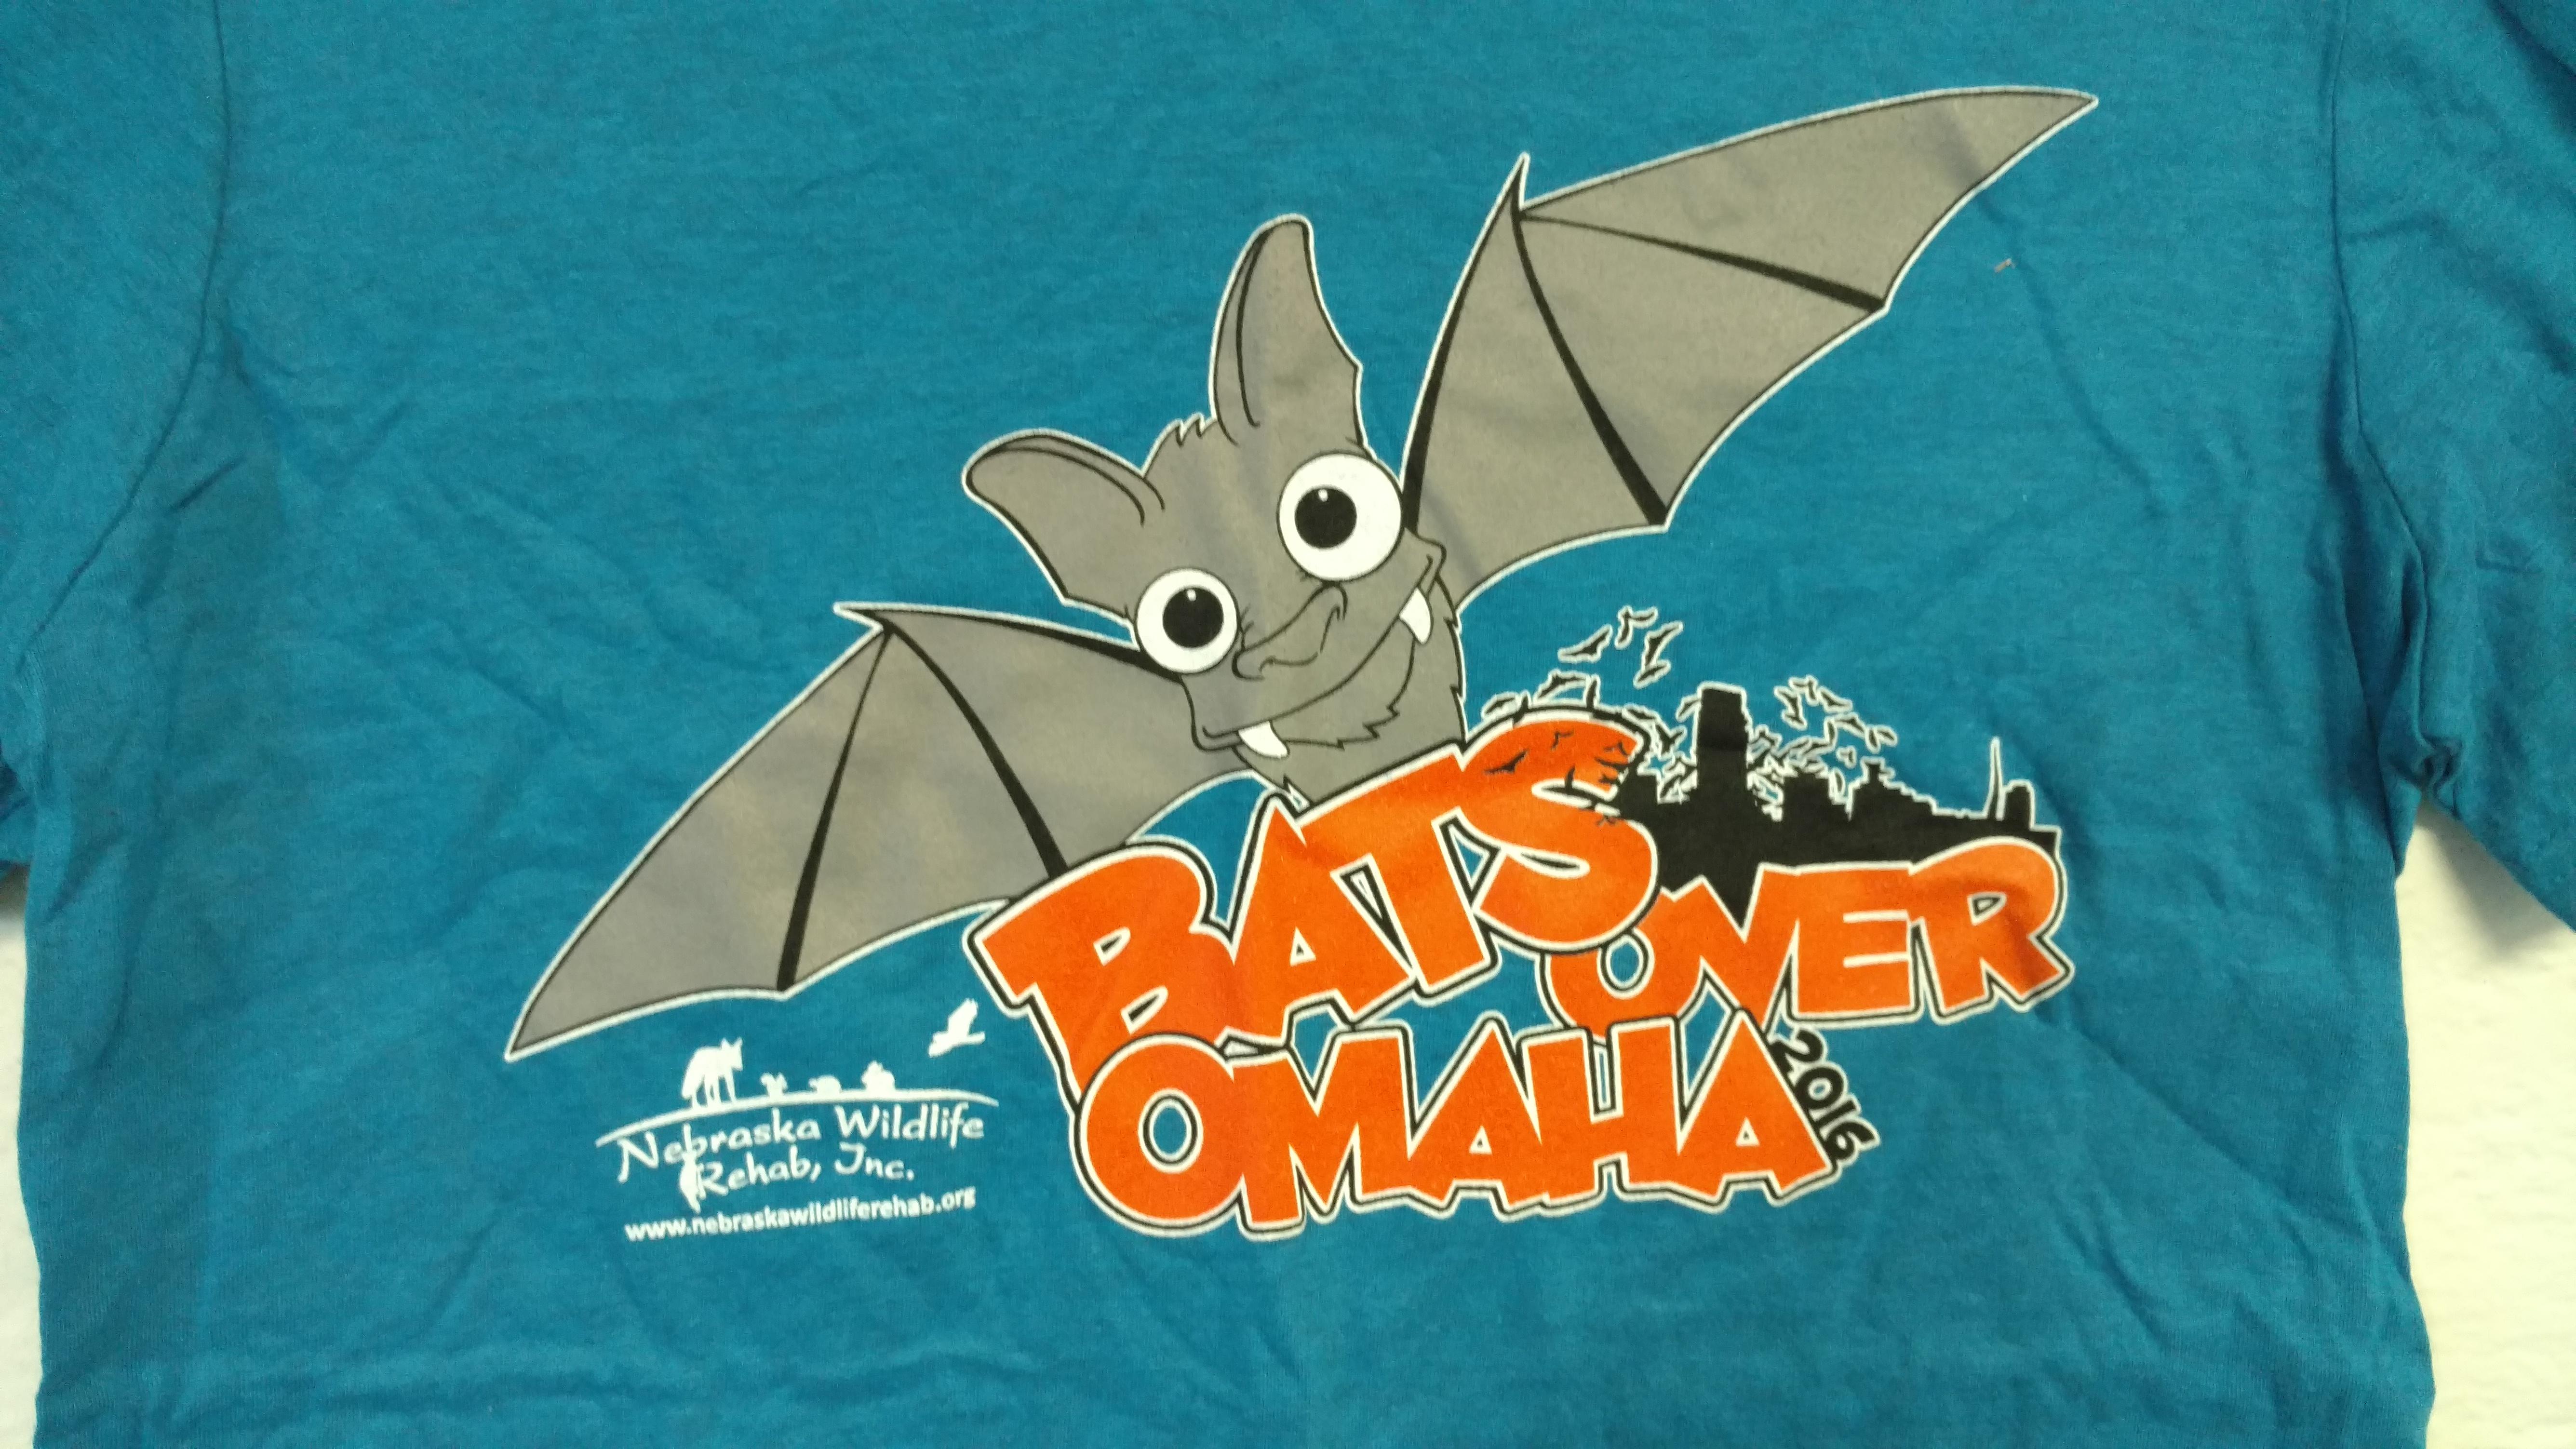 Bats Over Omaha Bat Release T-Shirt - 2016: Adult Medium, Teal